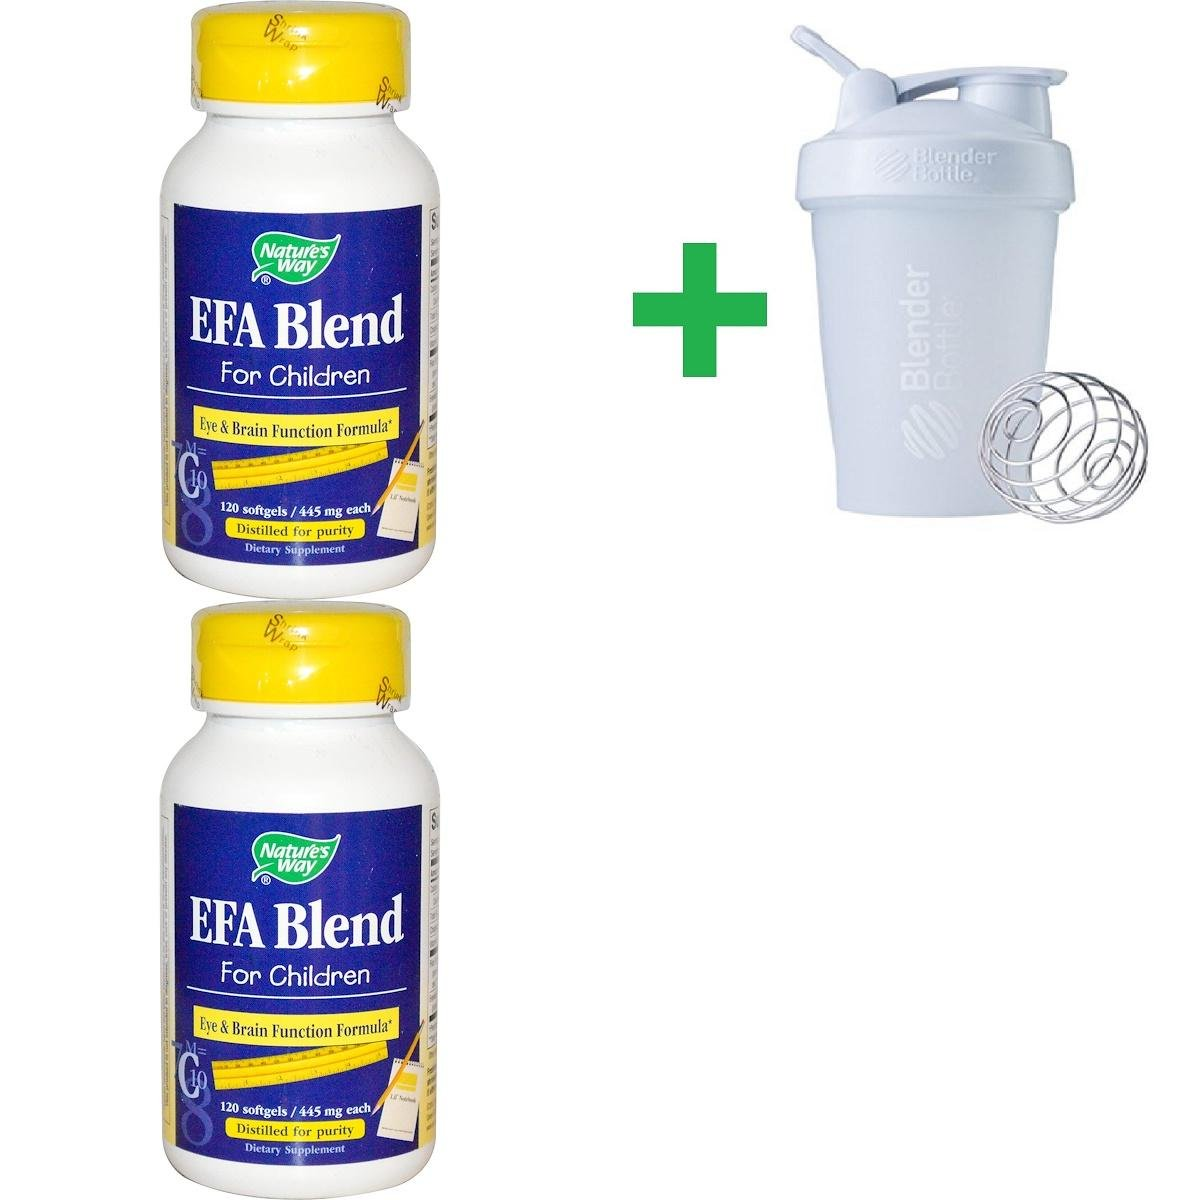 Nature's Way, EFA Blend, for Children, 445 mg, 120 Softgels(2 Packs)+ Assorted Sundesa, BlenderBottle, Classic With Loop, 20 oz